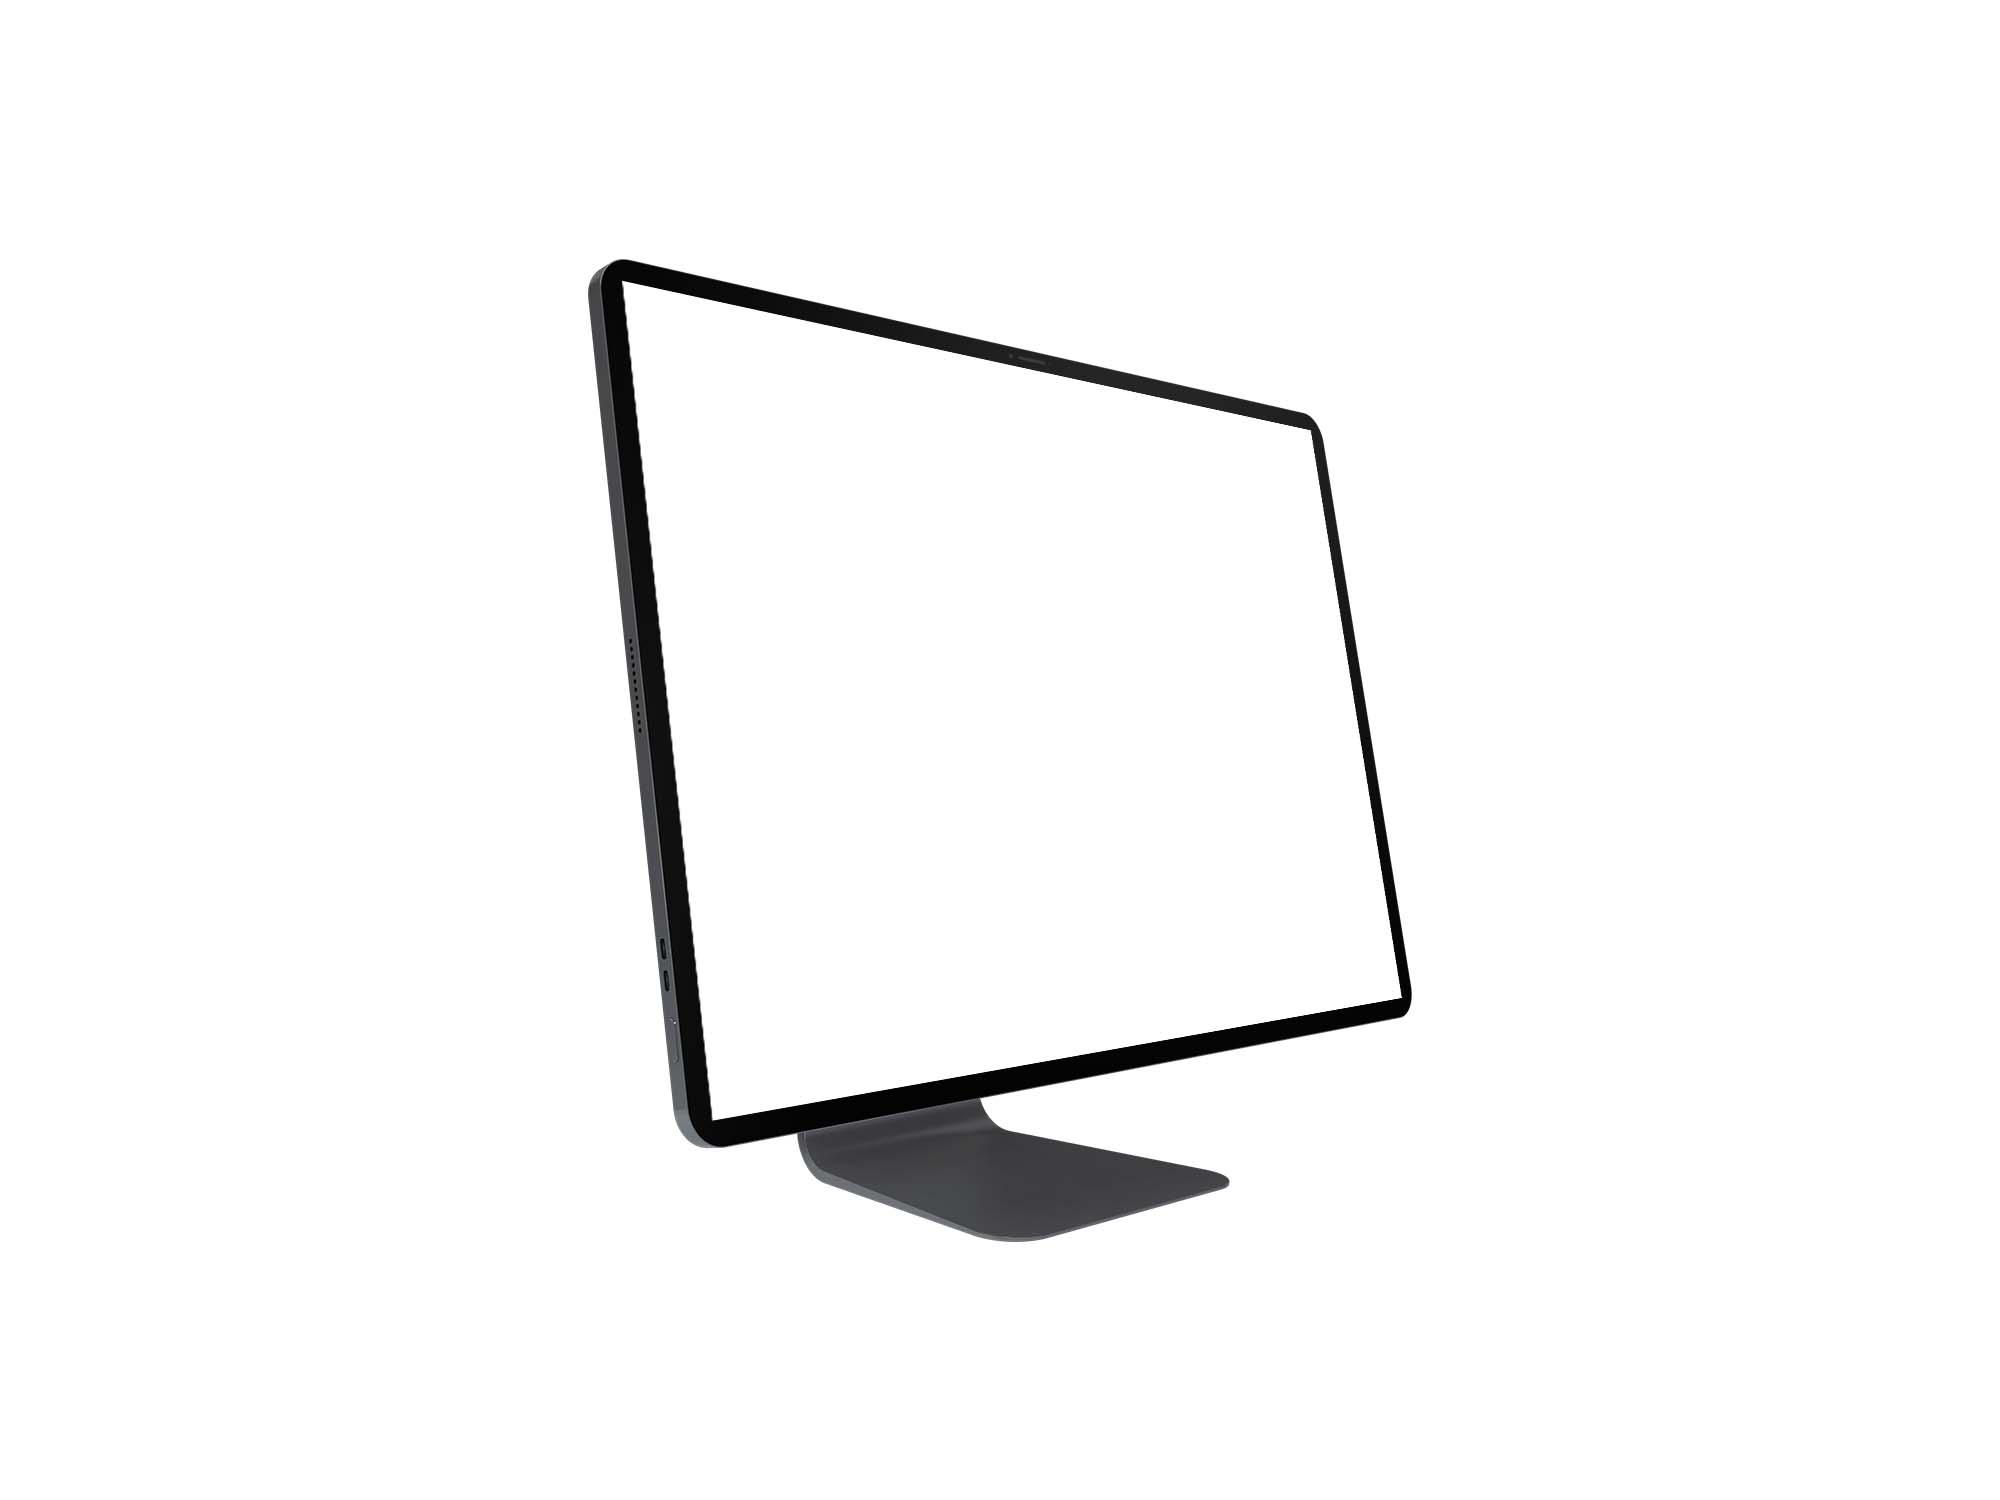 iMac Pro Mockup Concept 2